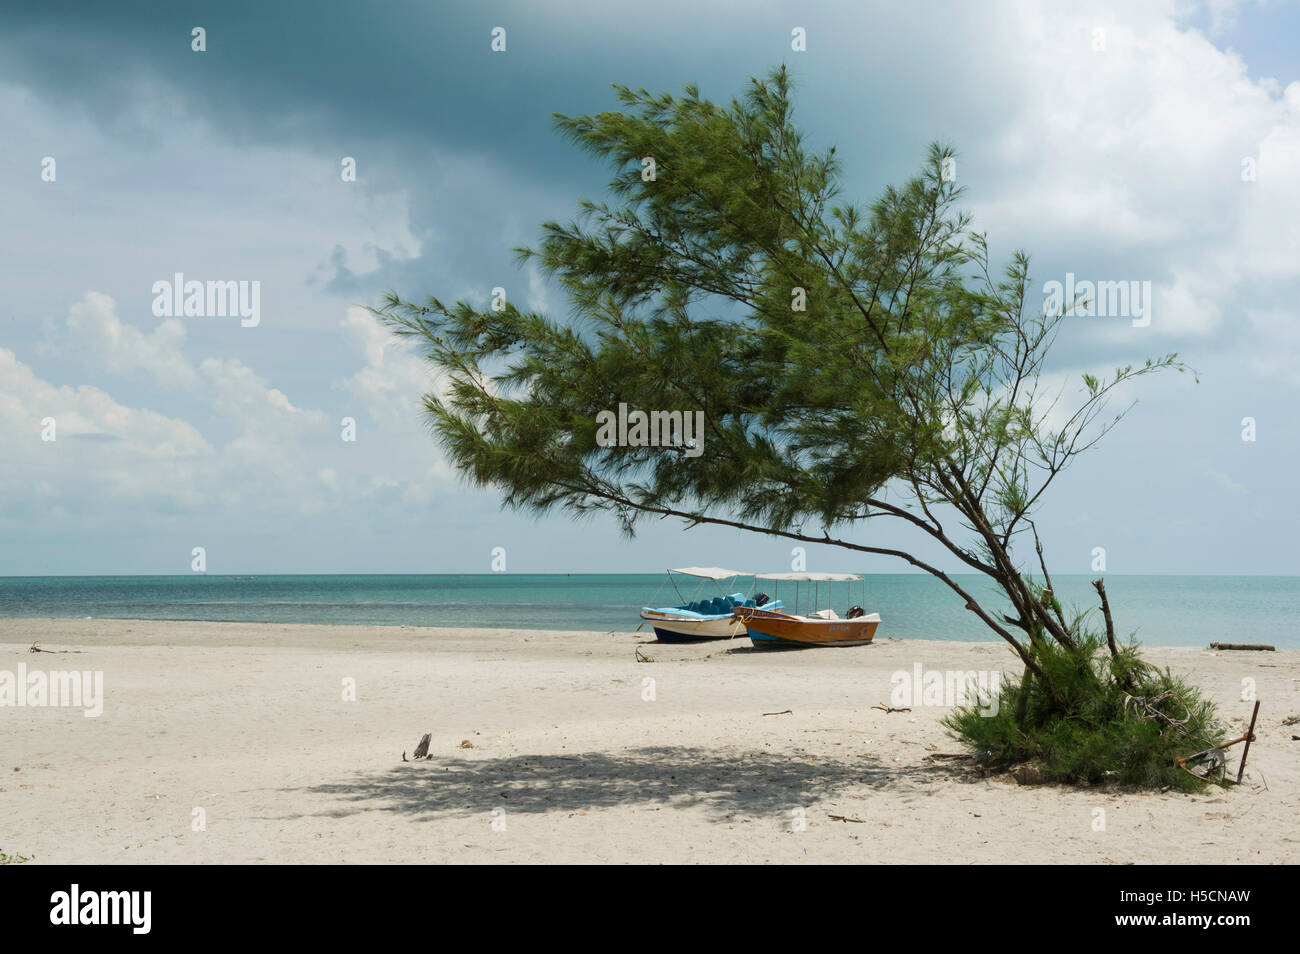 Casuarina beach, Karainagar, Jaffna Peninsula, Sri Lanka - Stock Image